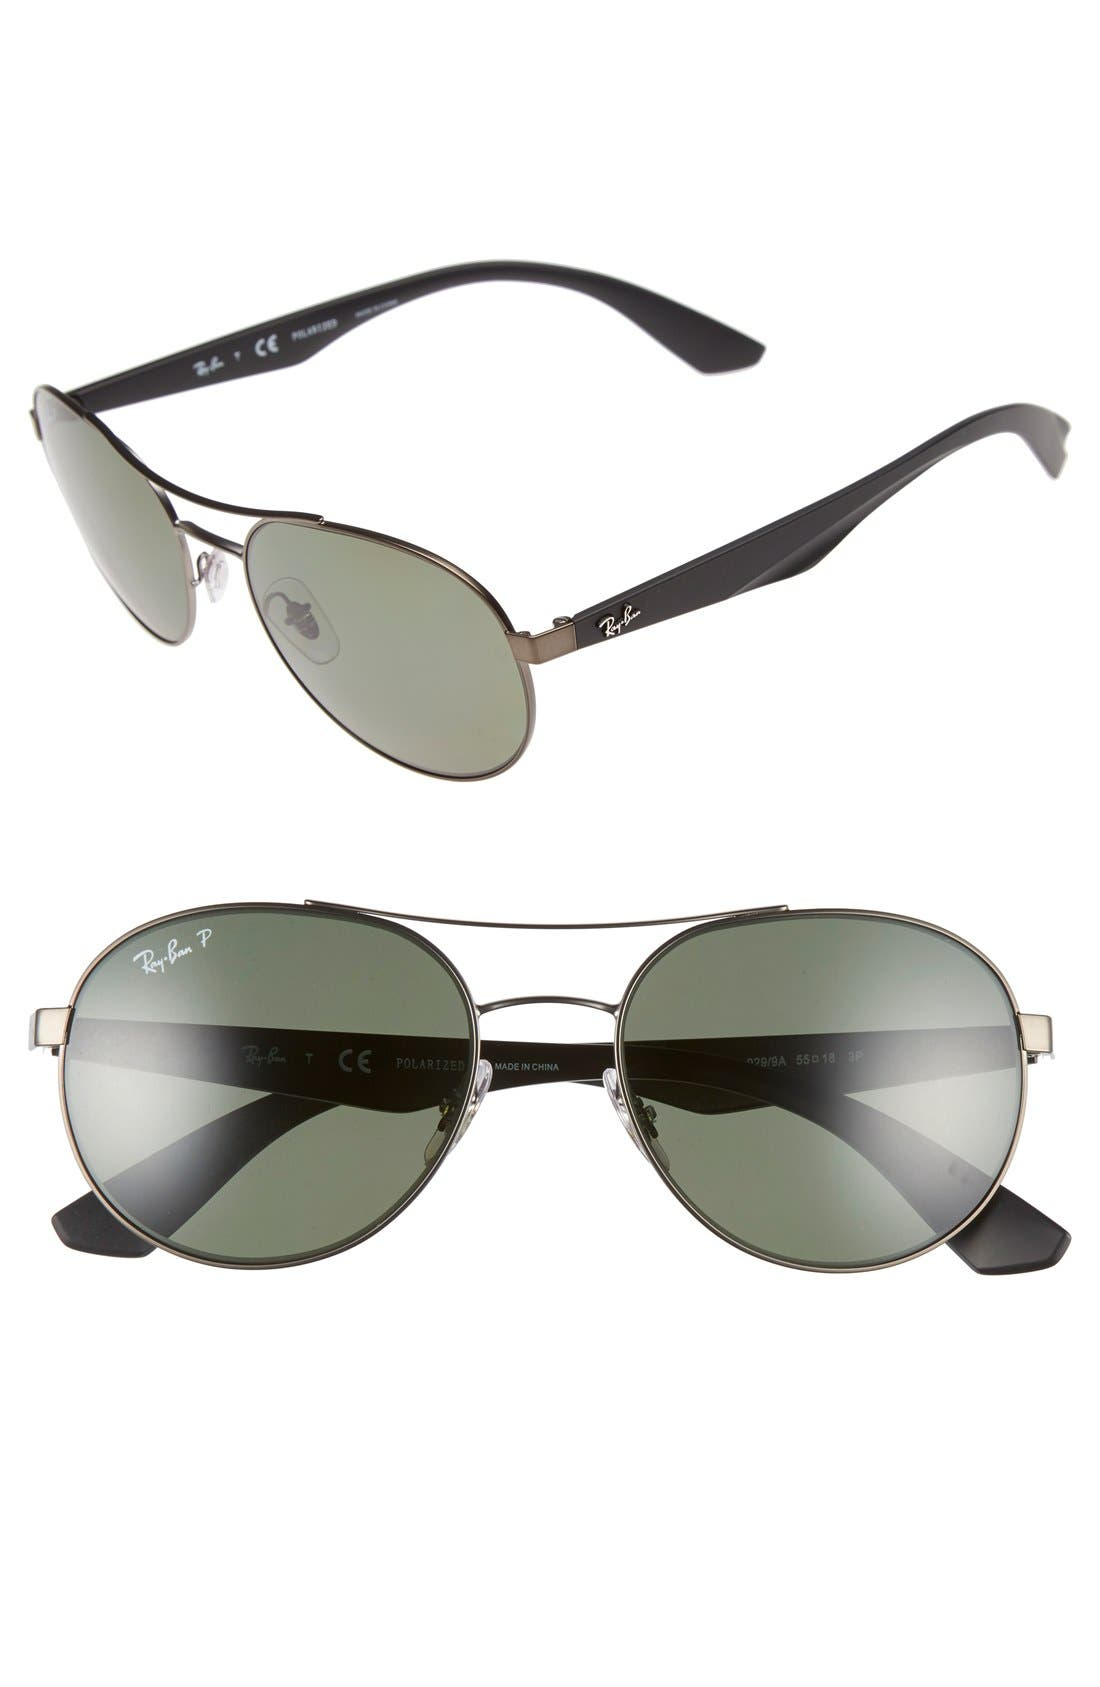 55mm Polarized Sunglasses,                         Main,                         color, 322